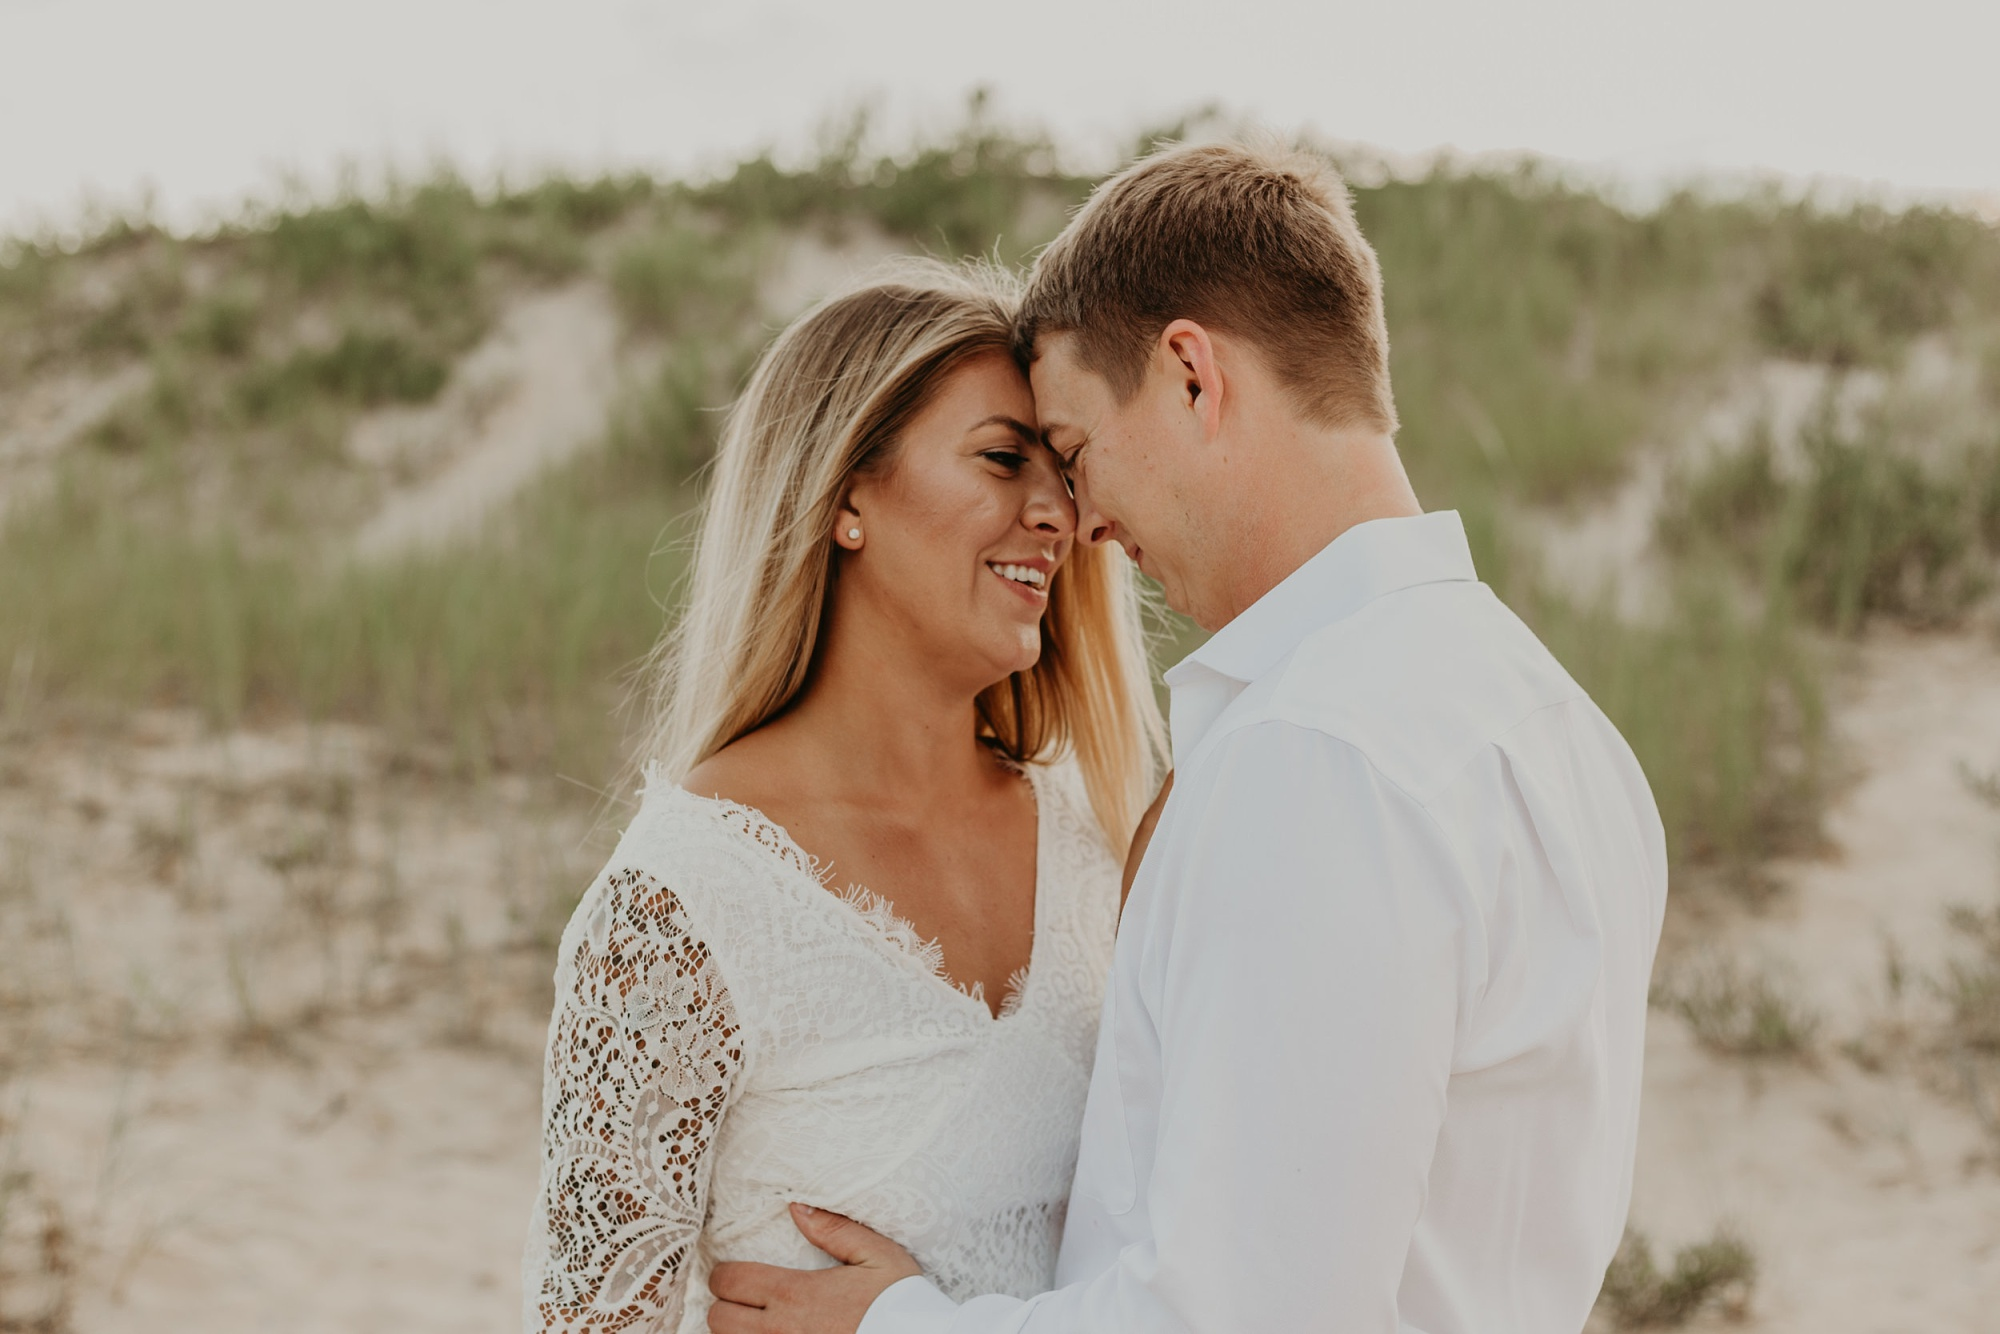 Petoskey Michigan wedding photographer